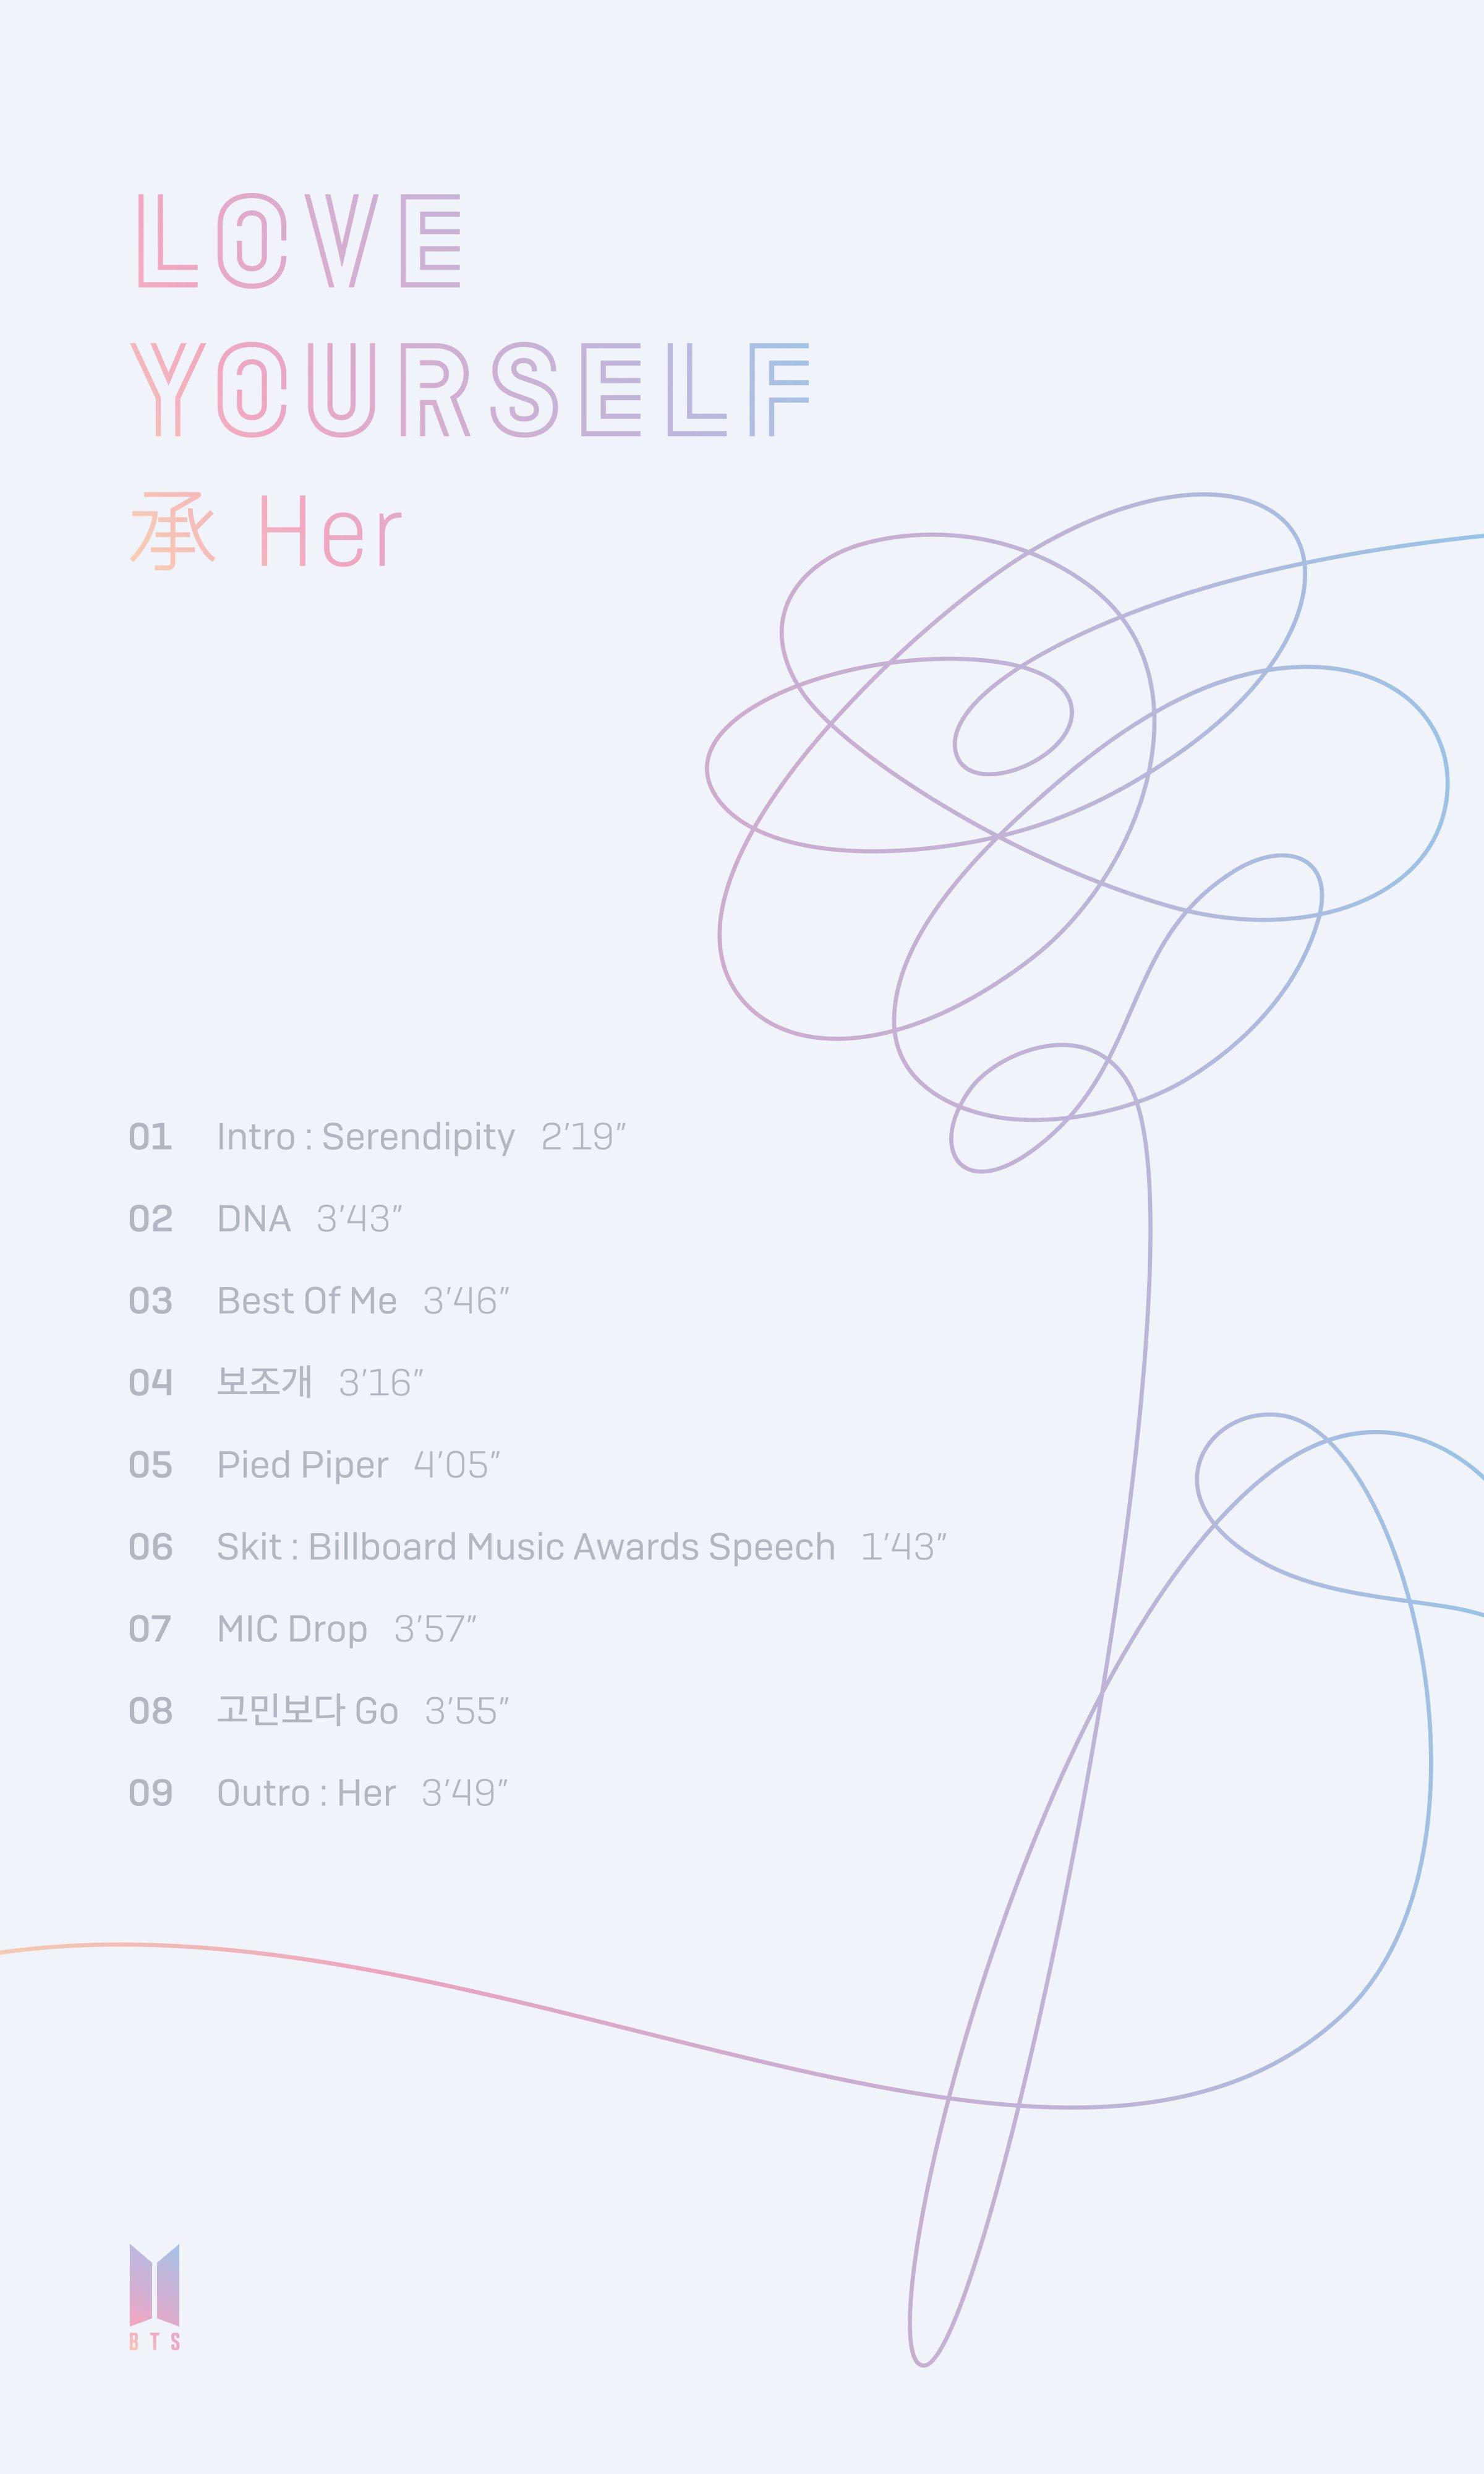 Bts 방탄소년단 love yourself 轉 tear 039singularity039 comeback trailer - 1 8